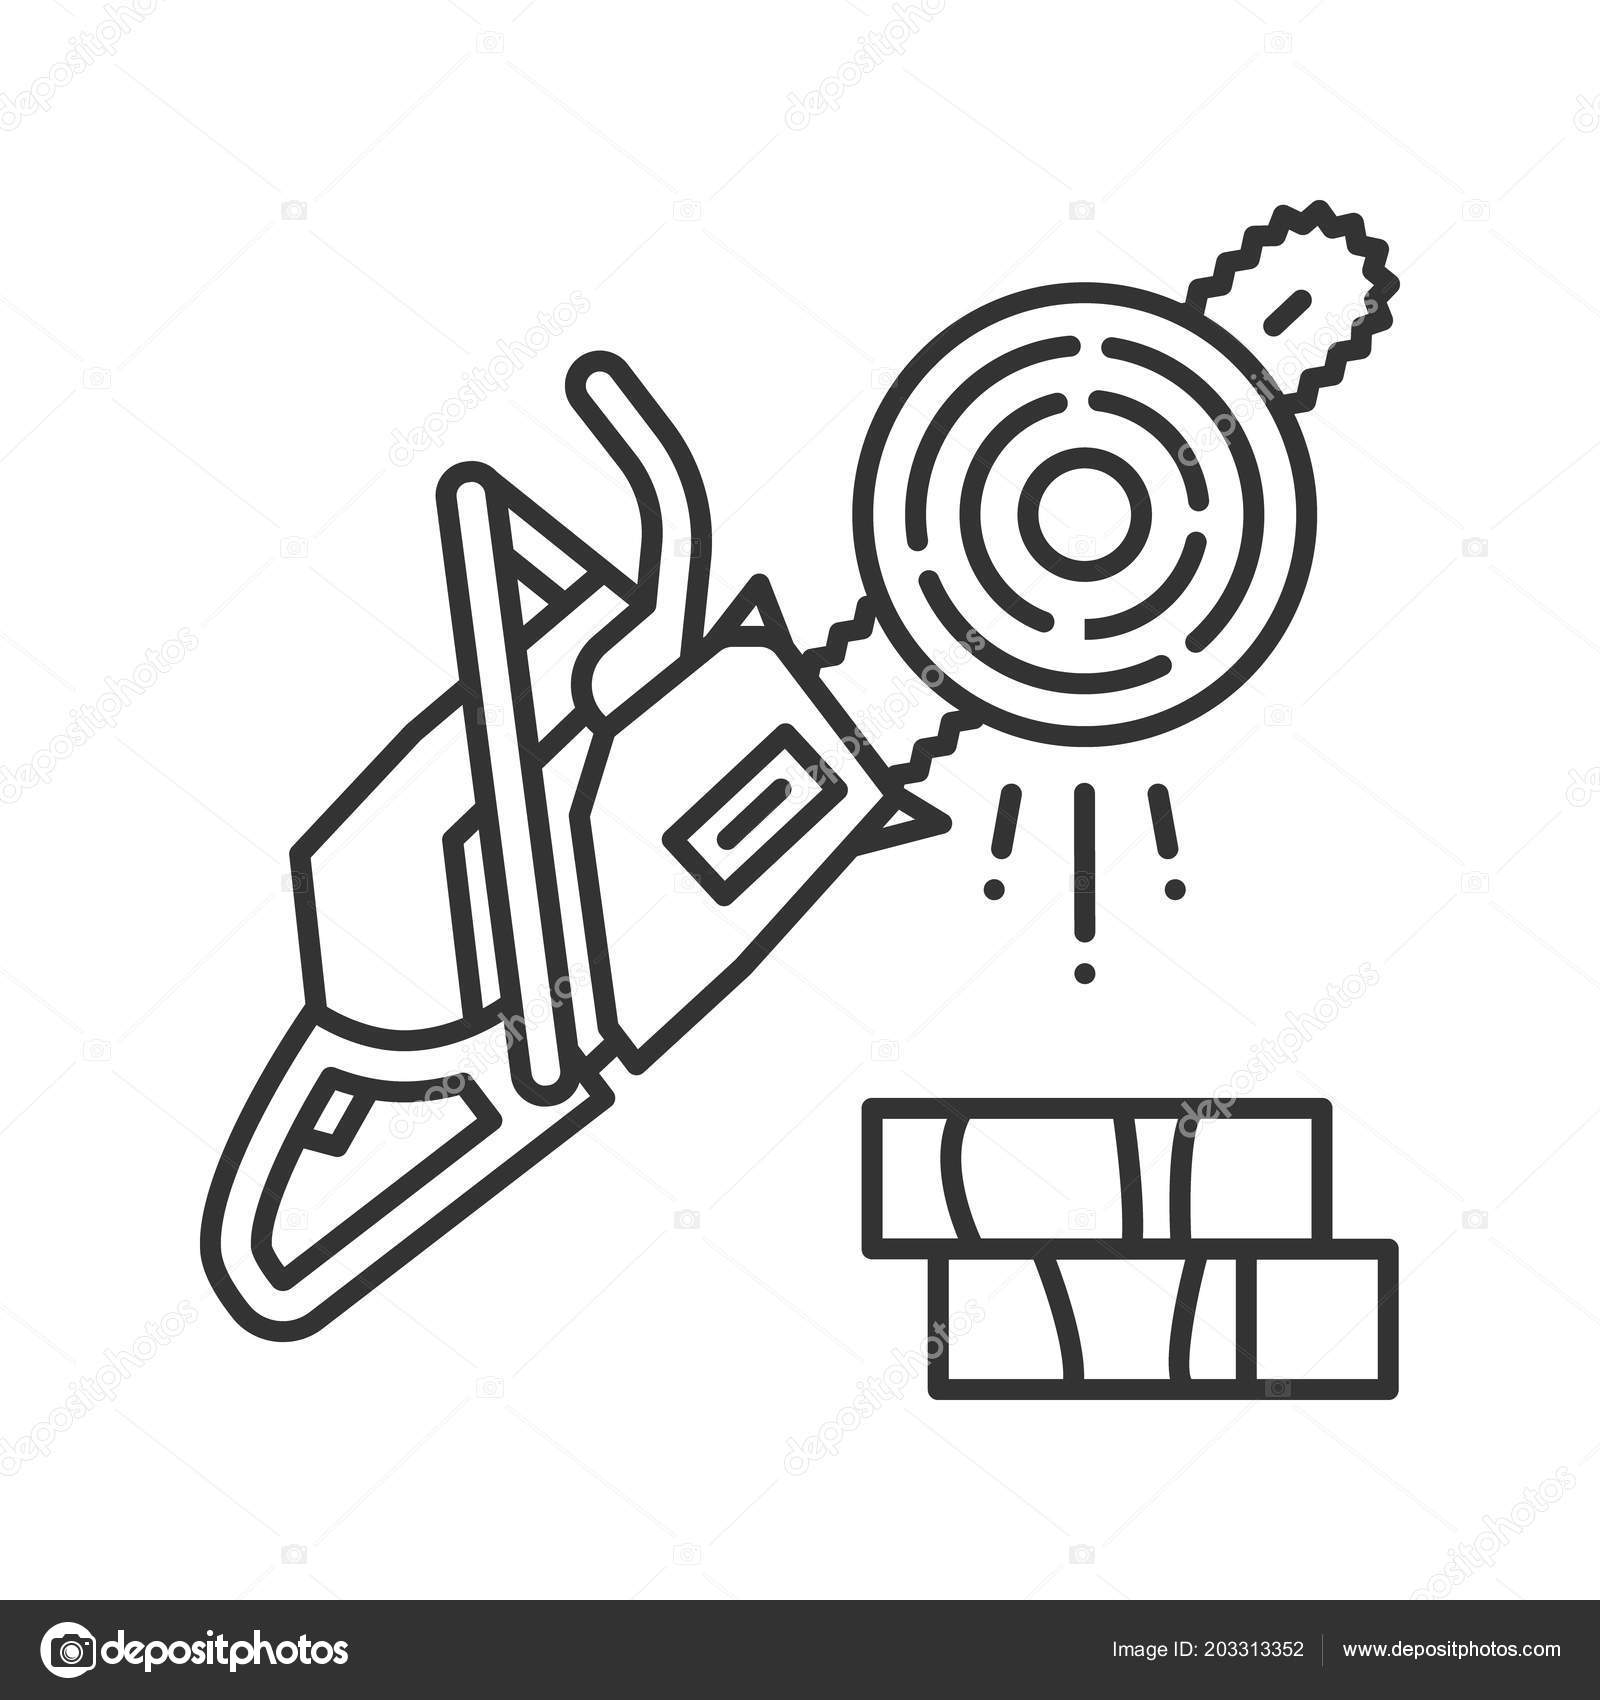 Chainsaw Linear Icon Logging Thin Line Illustration Petrol